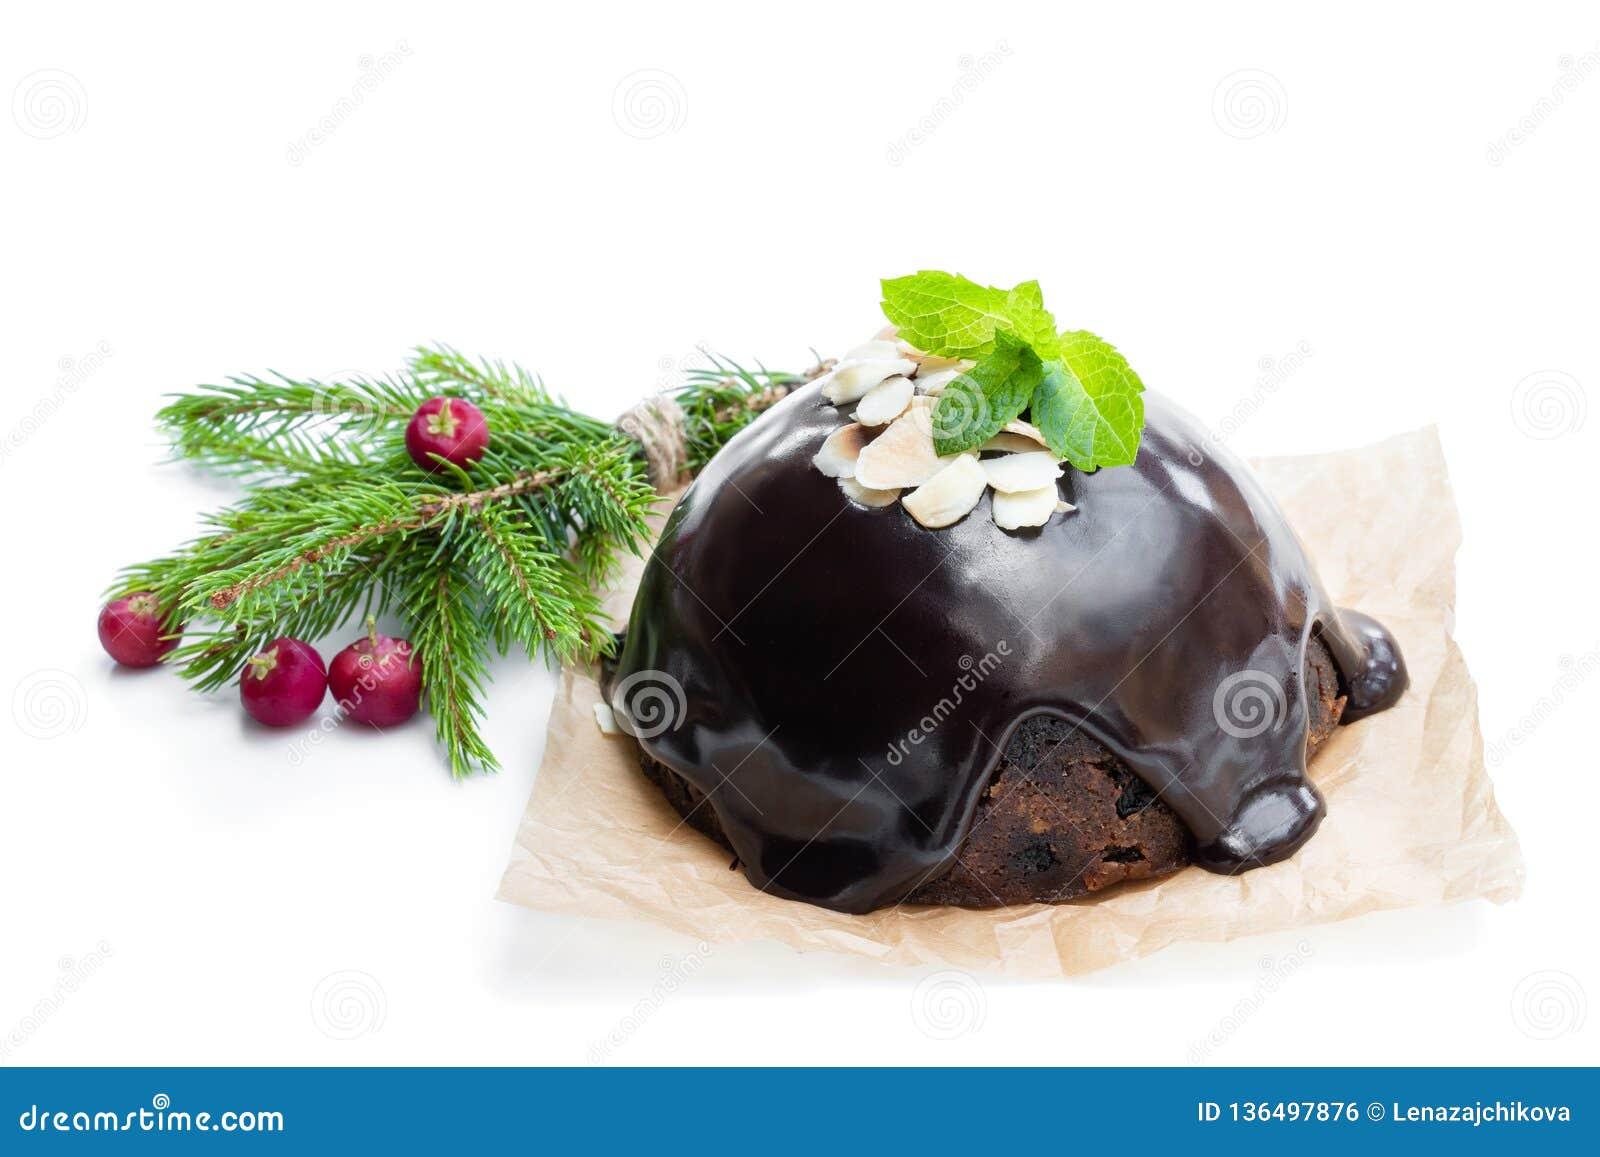 Homemade Christmas pudding isolated on white